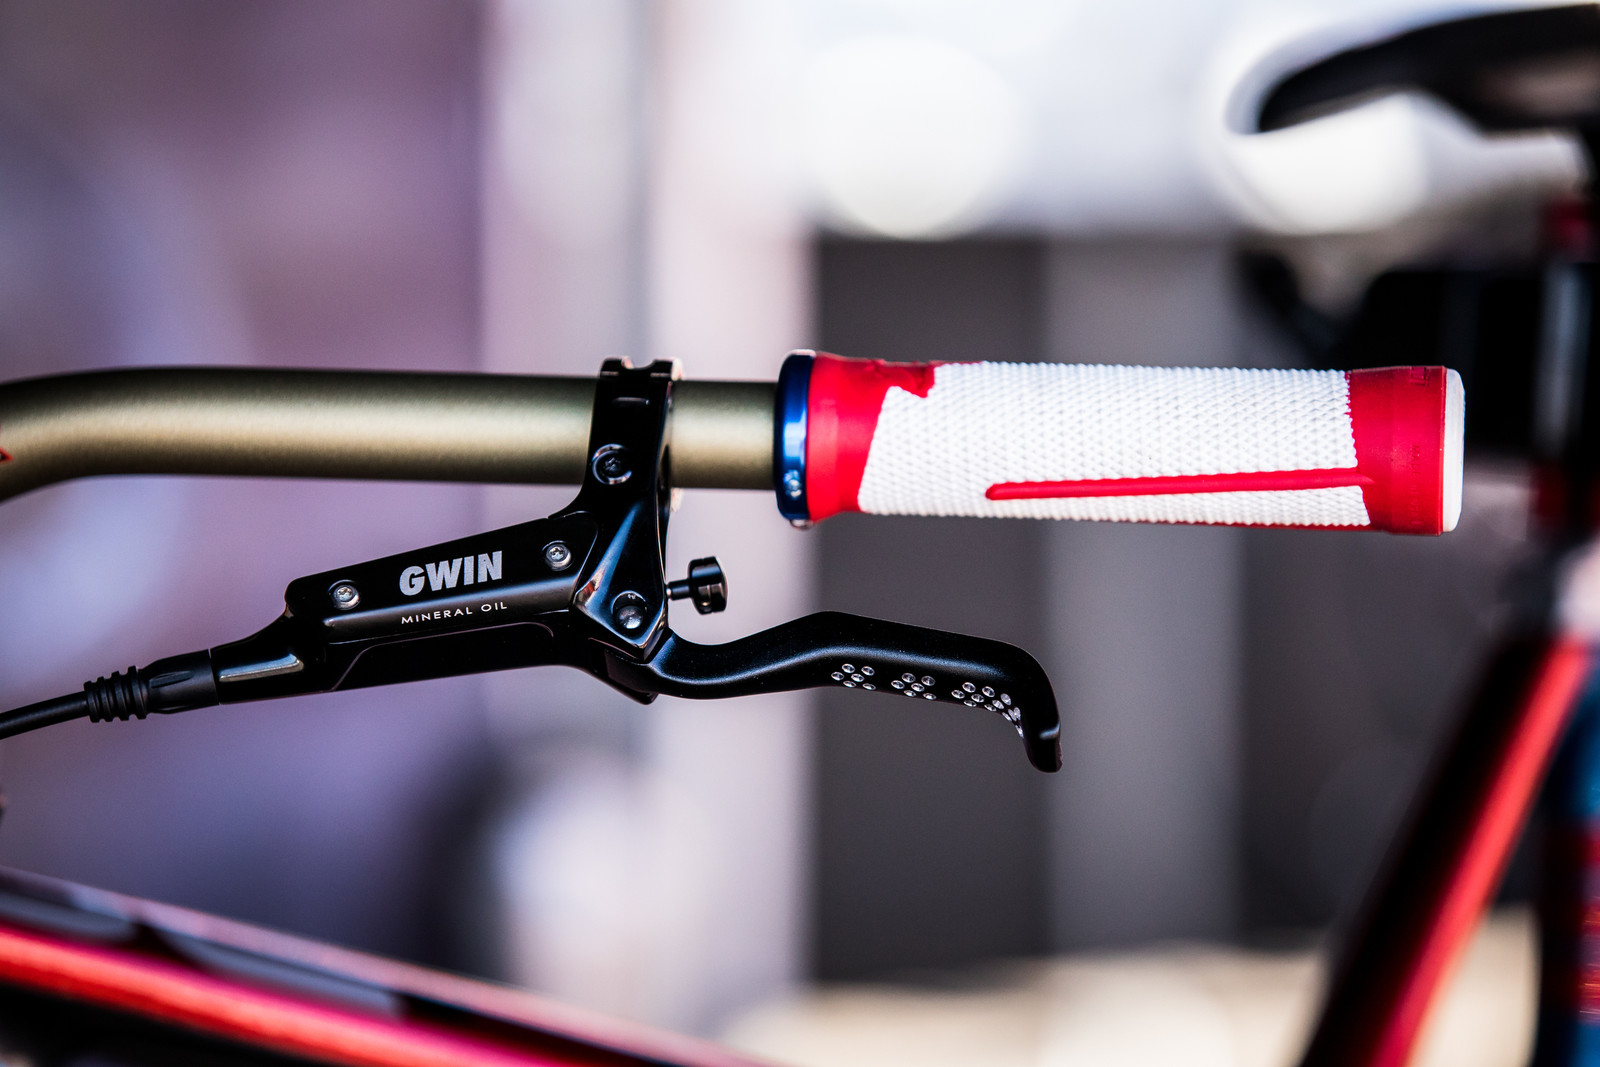 Aaron Gwin's Intense M29 at 2019 Worlds MSA - Aaron Gwin's Intense M279 at 2019 Worlds MSA - Mountain Biking Pictures - Vital MTB